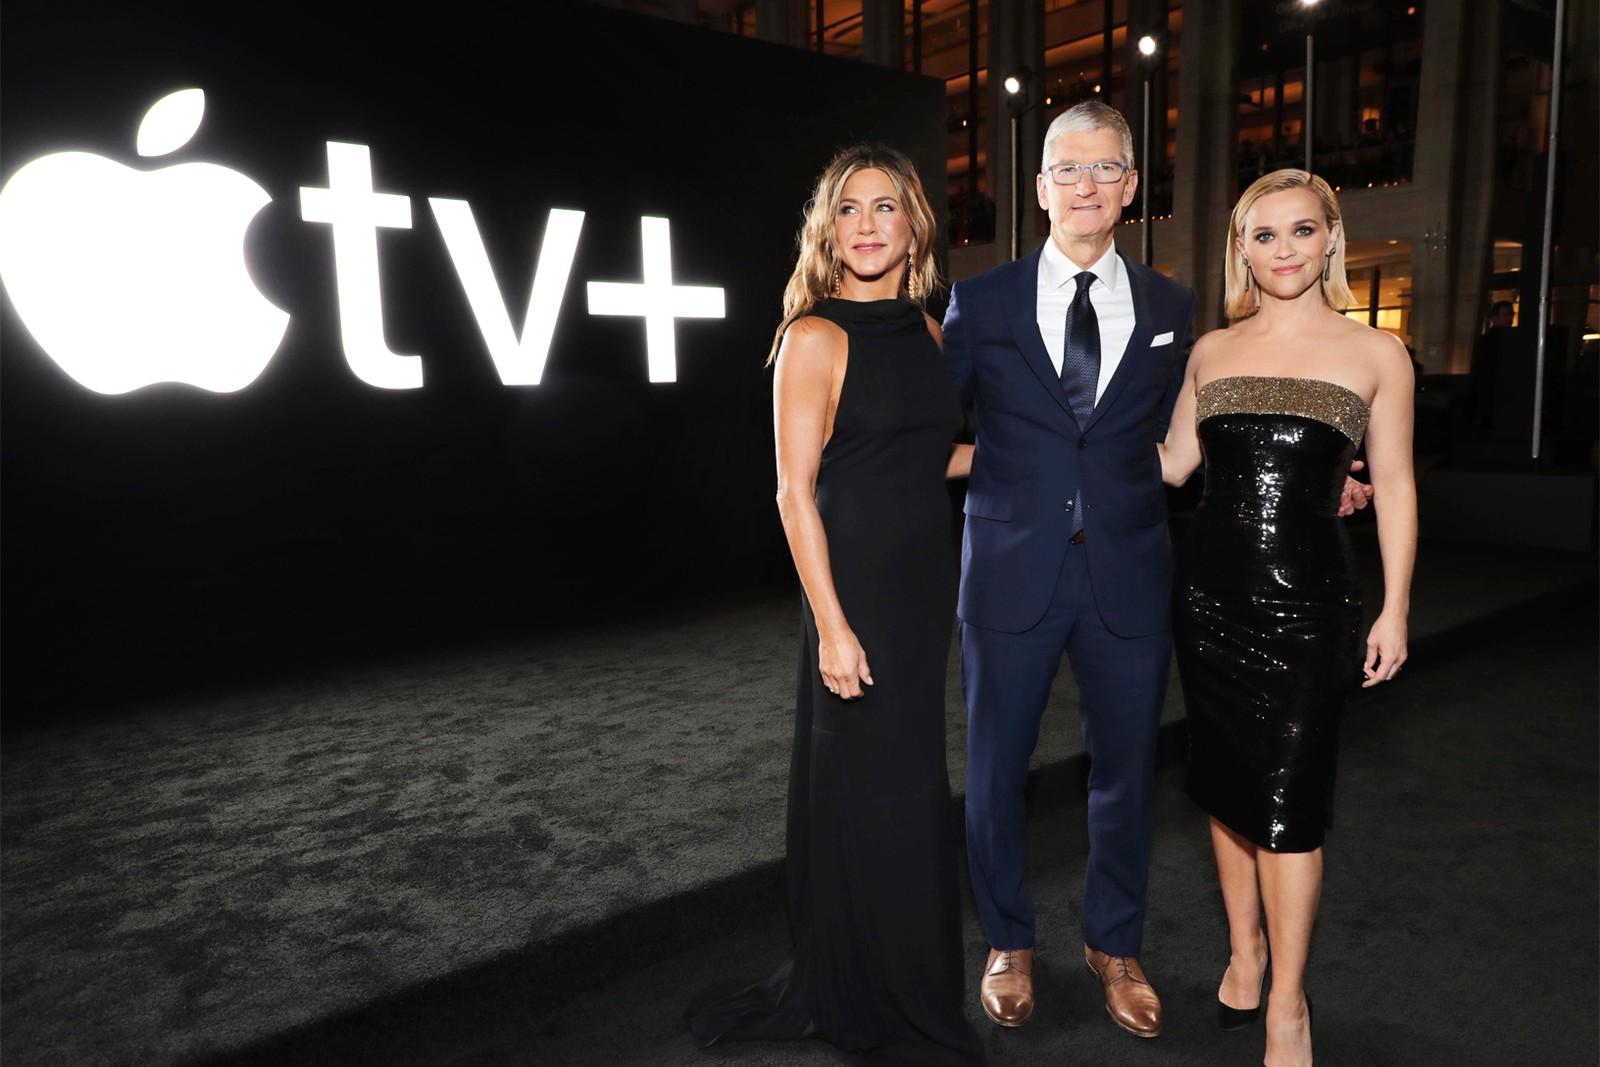 Apple TV+ 已经获得近 400 个奖项提名